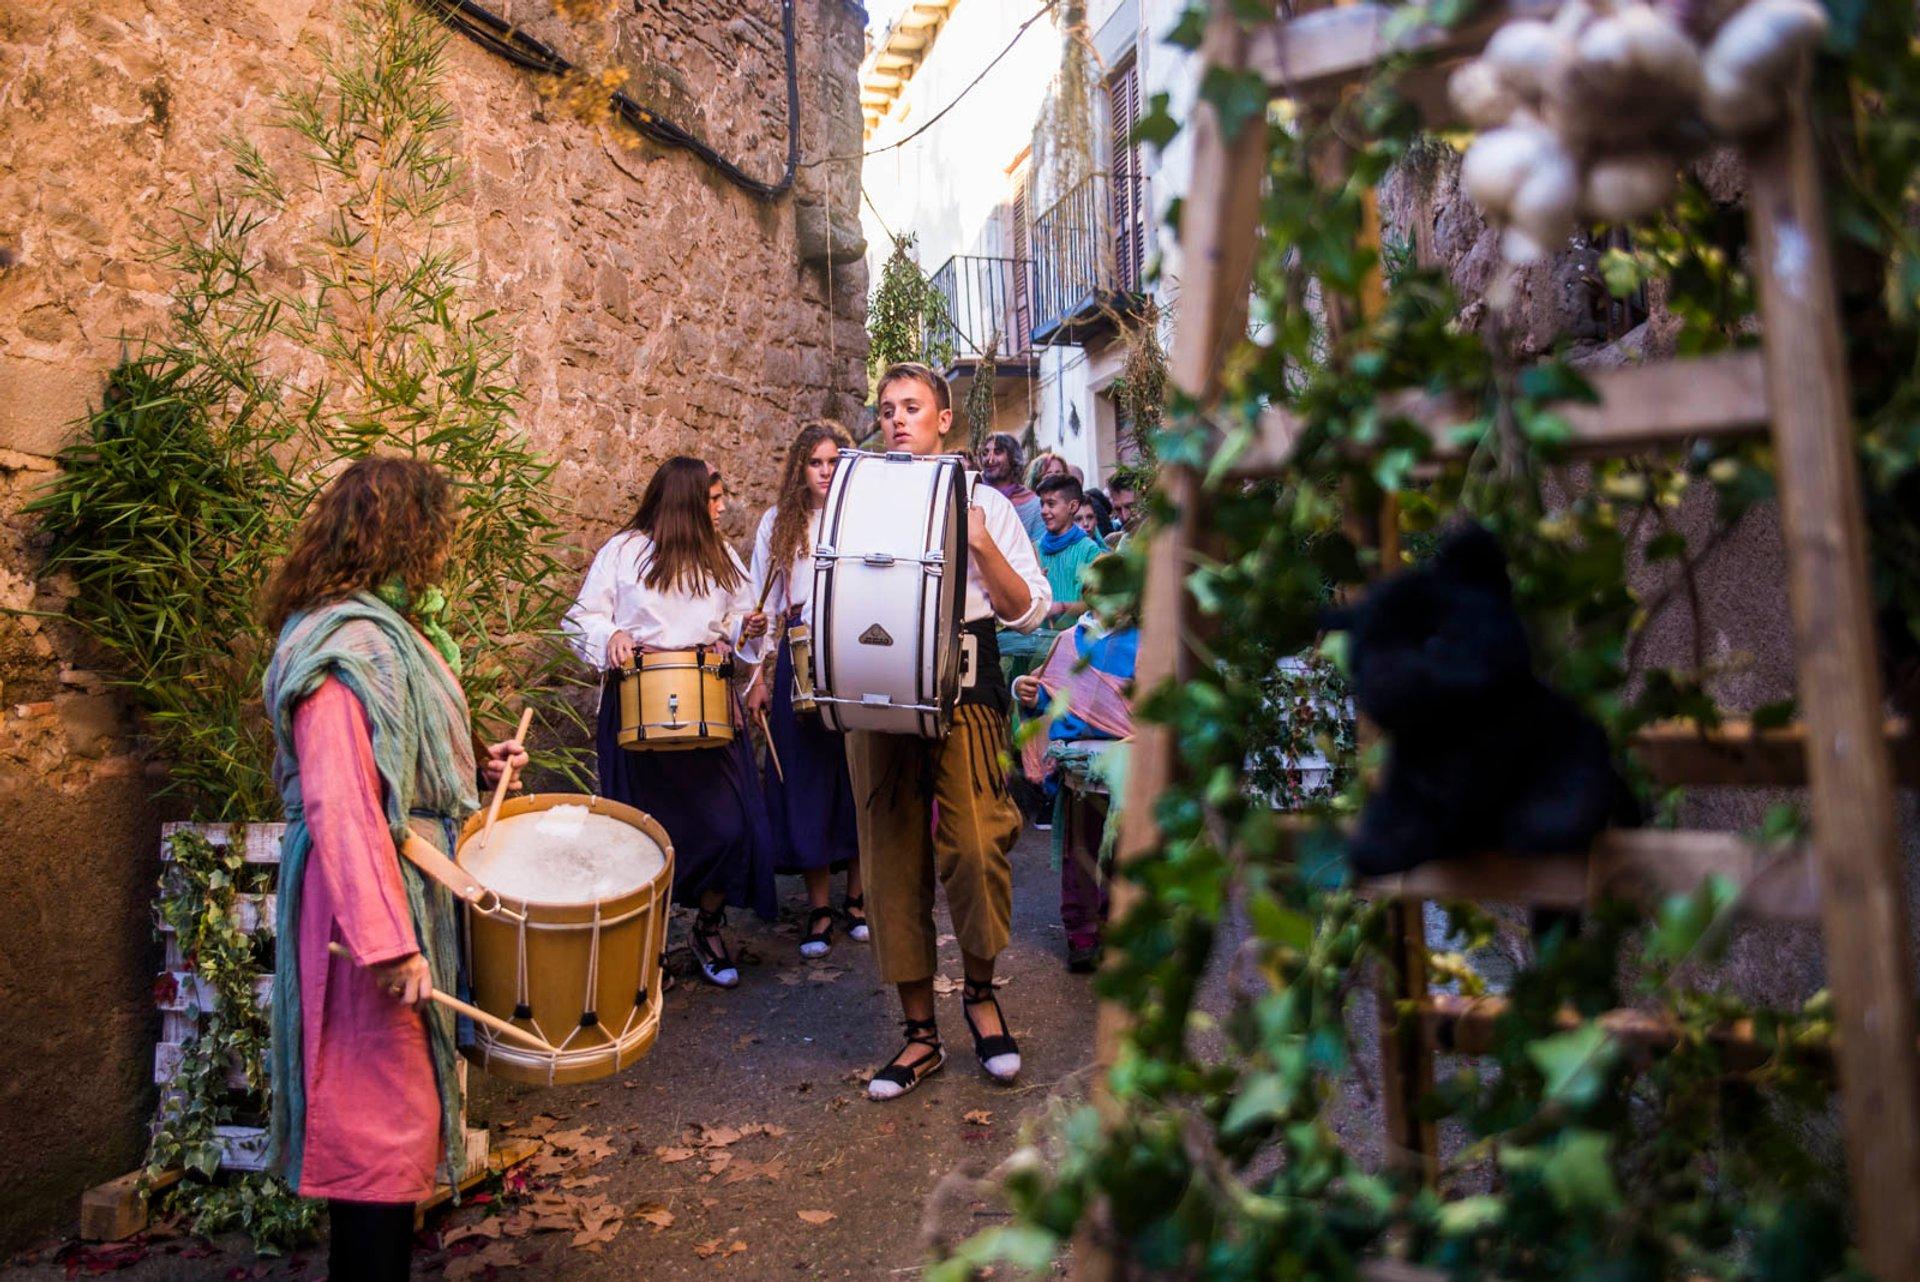 Fira de les Bruixes in Sant Feliu Sasserra 2020